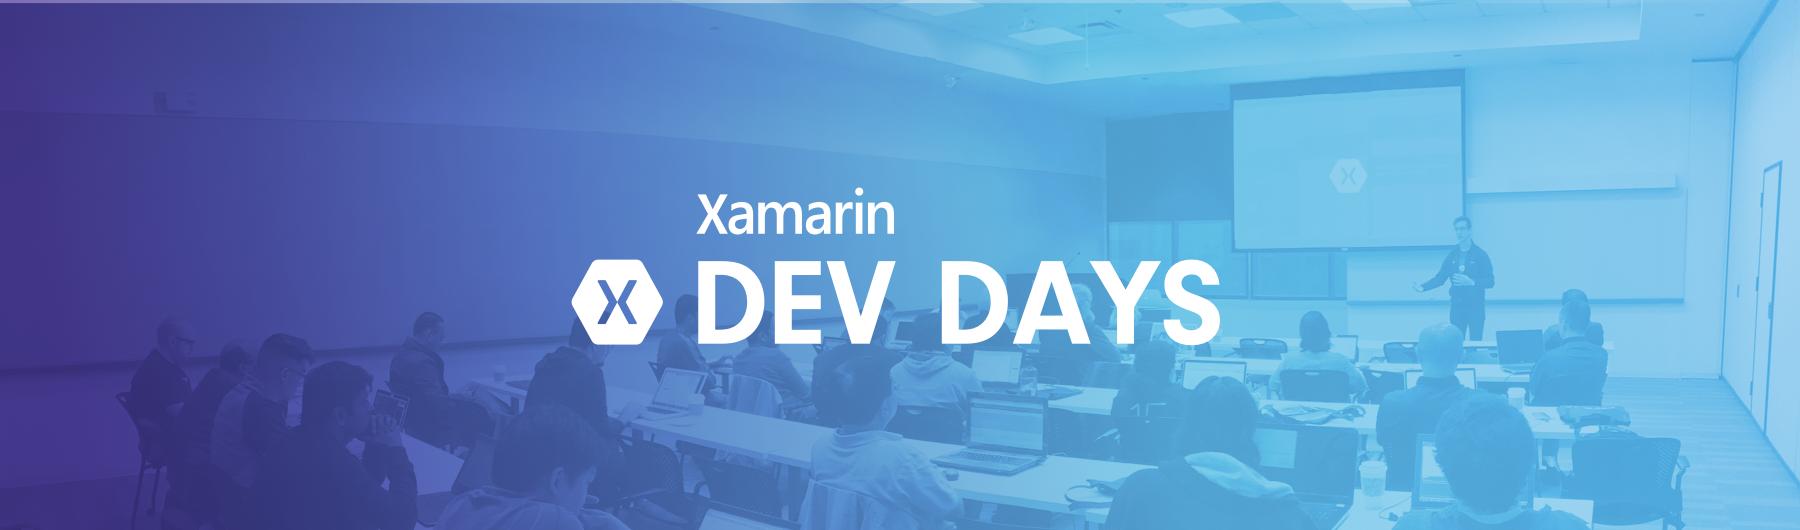 Xamarin Dev Days - Singapore